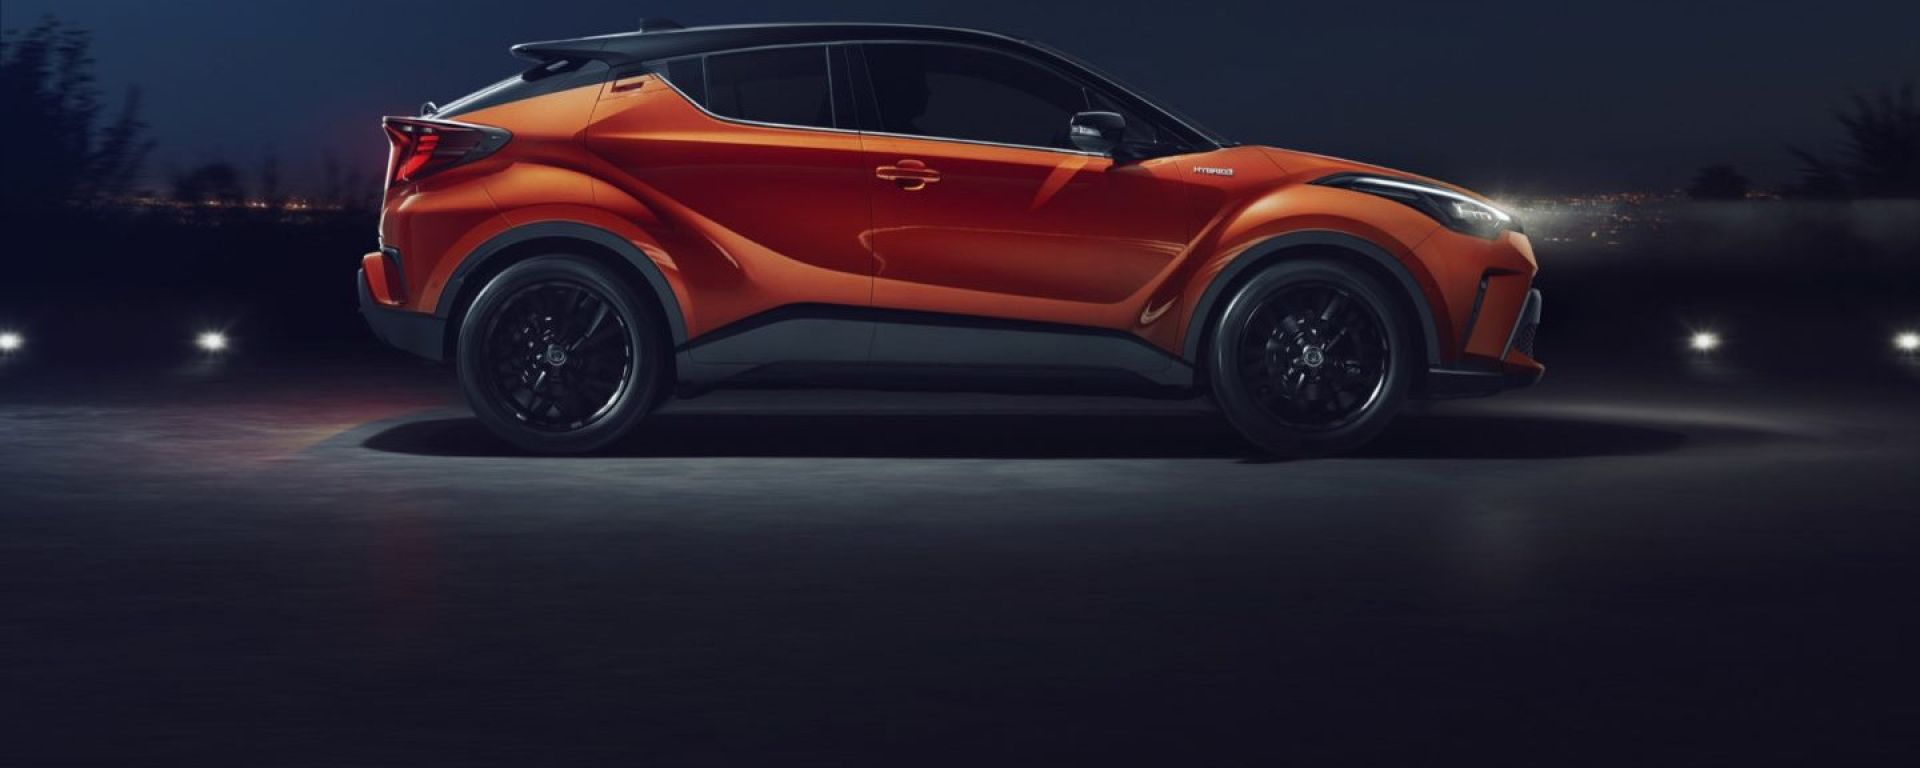 Toyota C-HR 2020: fari a Led davanti e dietro